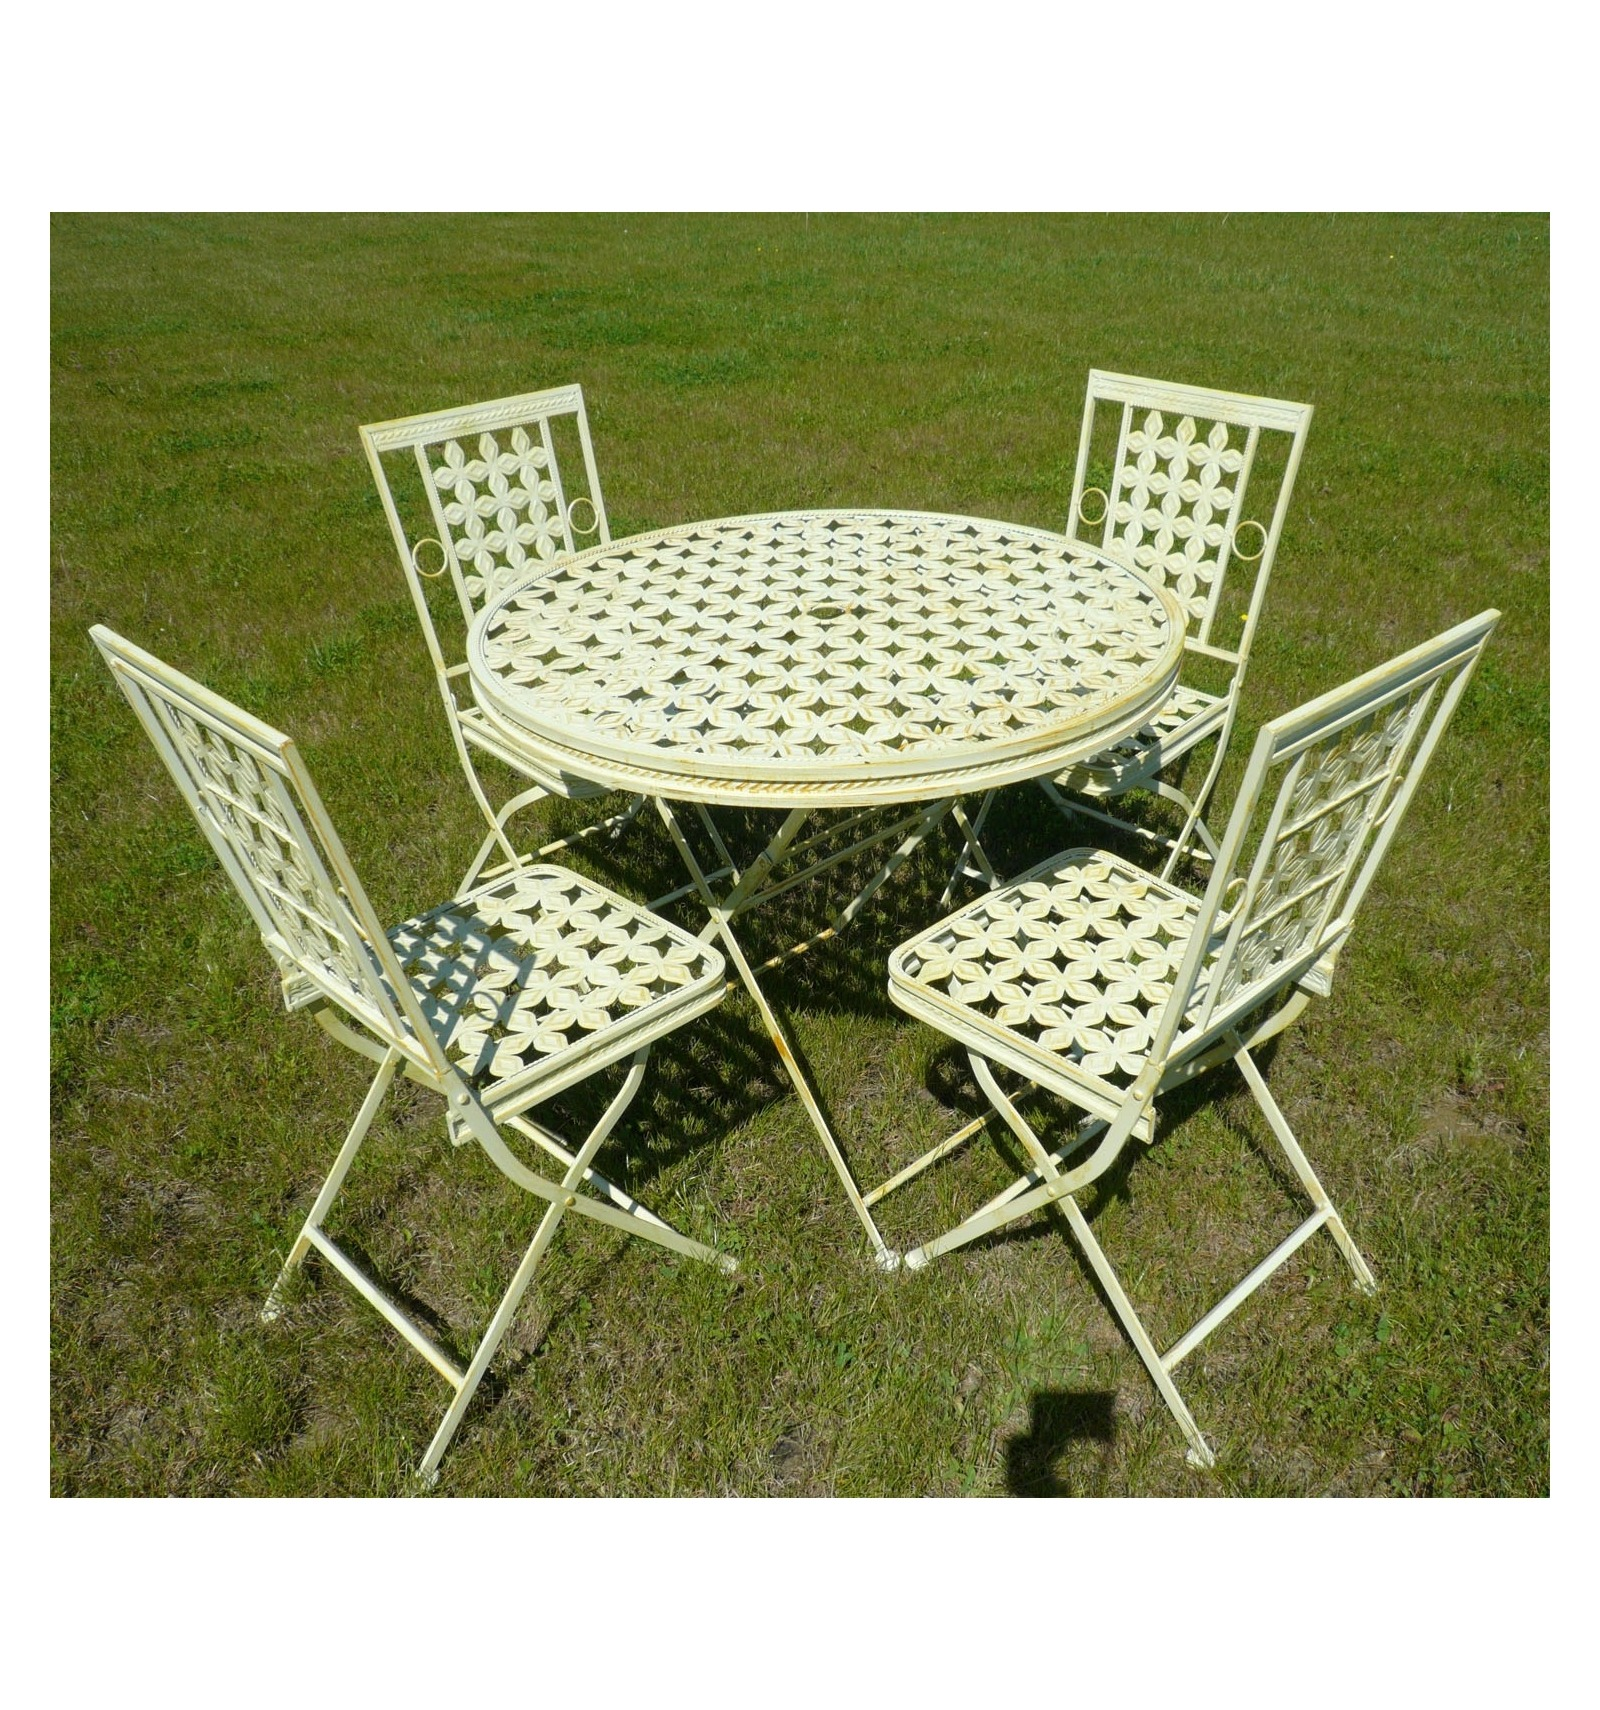 El hierro forjado muebles de jard n mesas sillas bancos for Muebles de jardin de hierro forjado